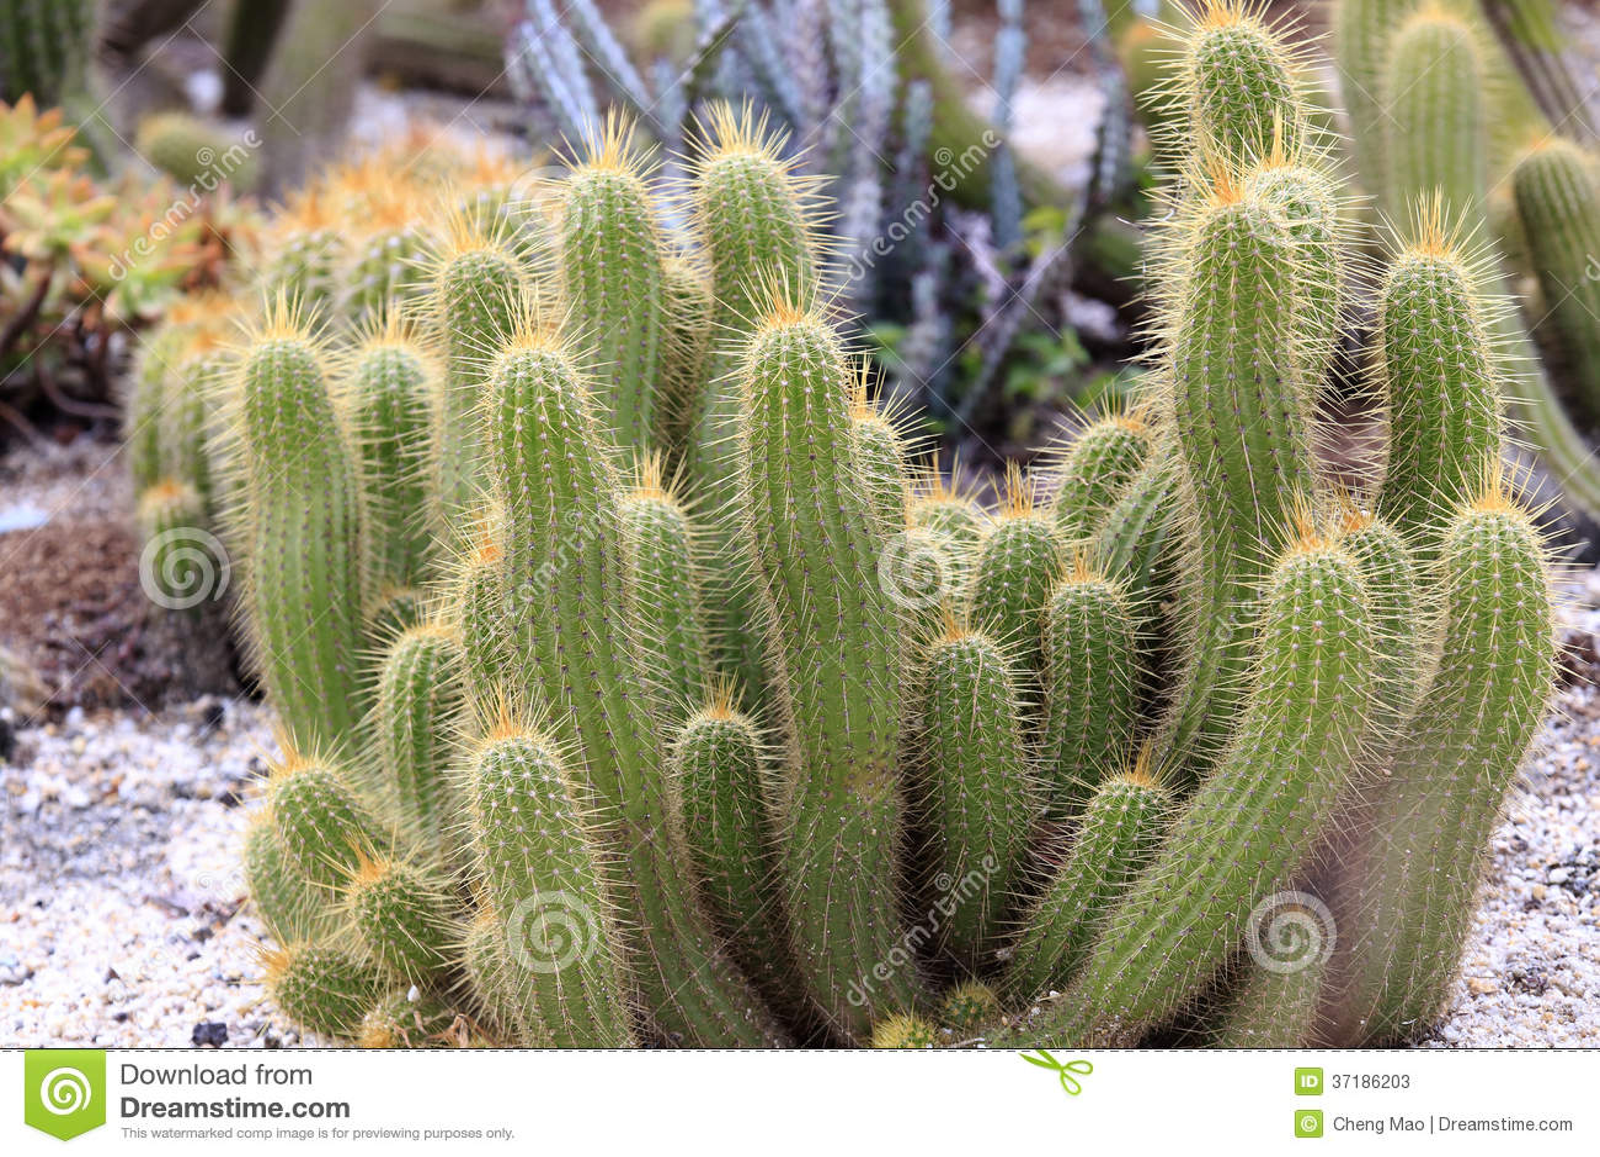 Cactus succulente della pianta immagine stock immagine for Pianta cactus